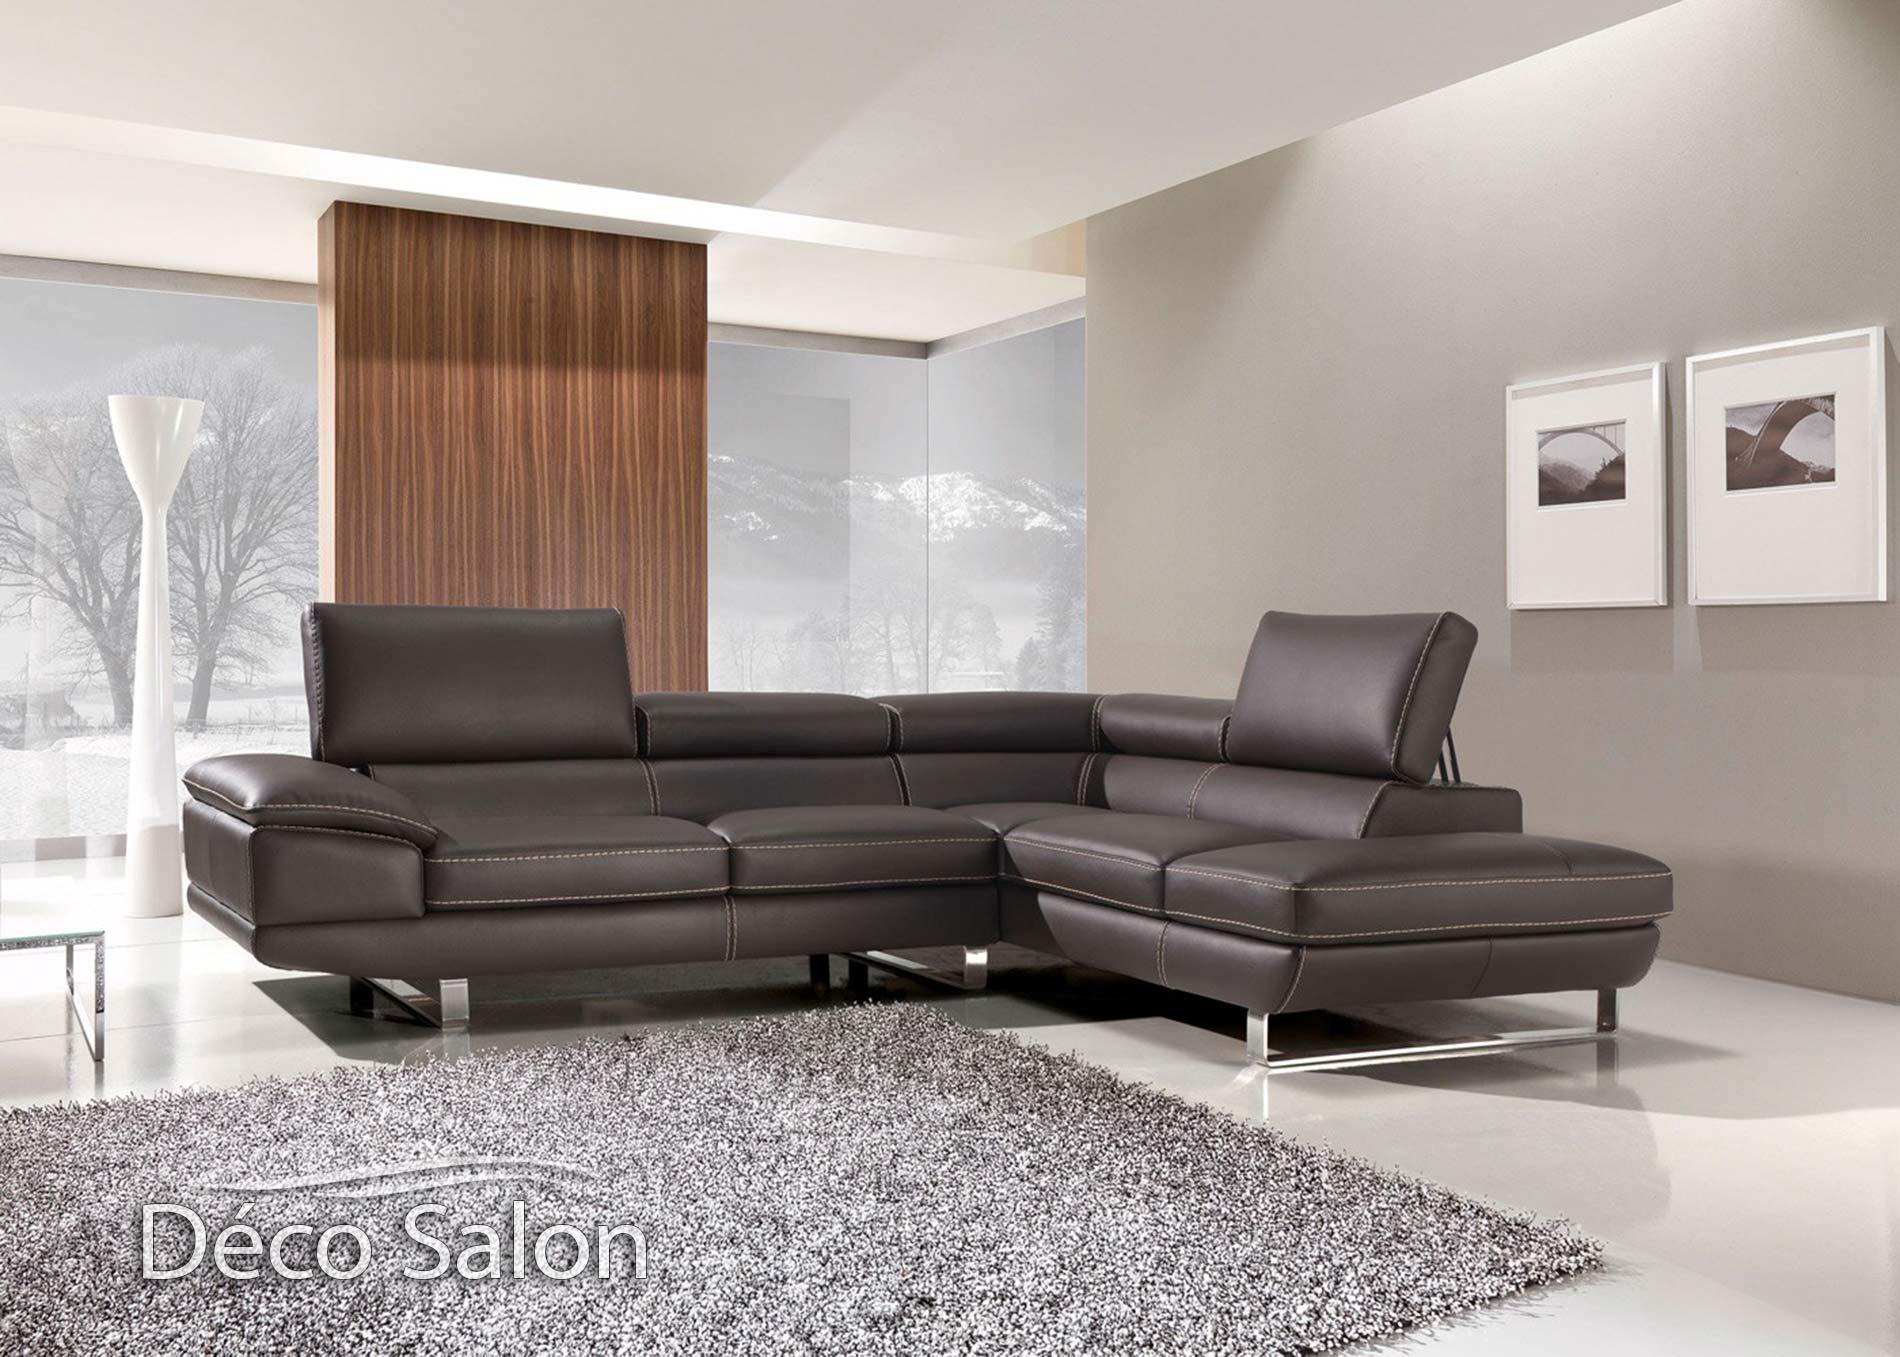 37 luxe magasin canap montpellier salon jardin - Magasins de meubles montpellier ...